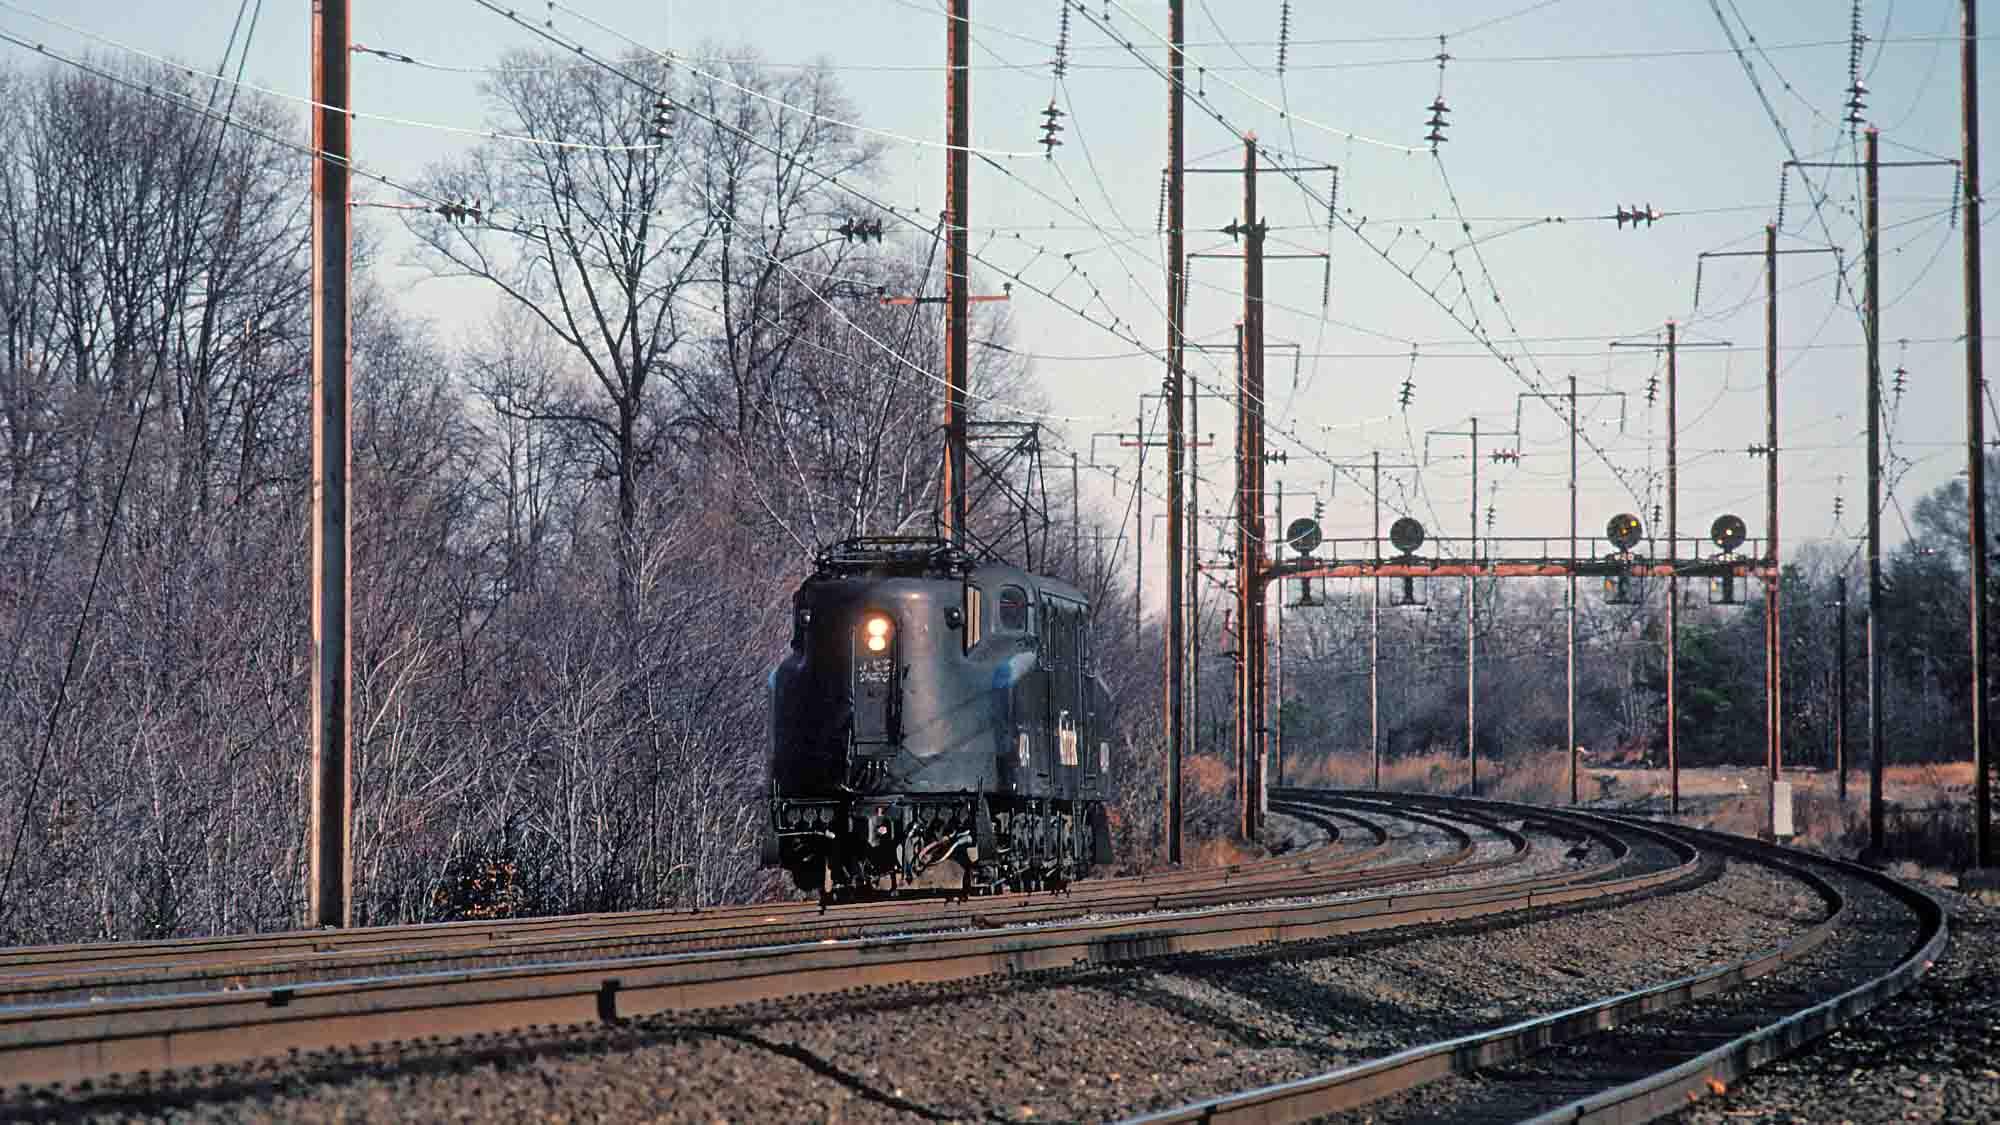 GG1-Light-Engine-Middle_River-Maryland-1980